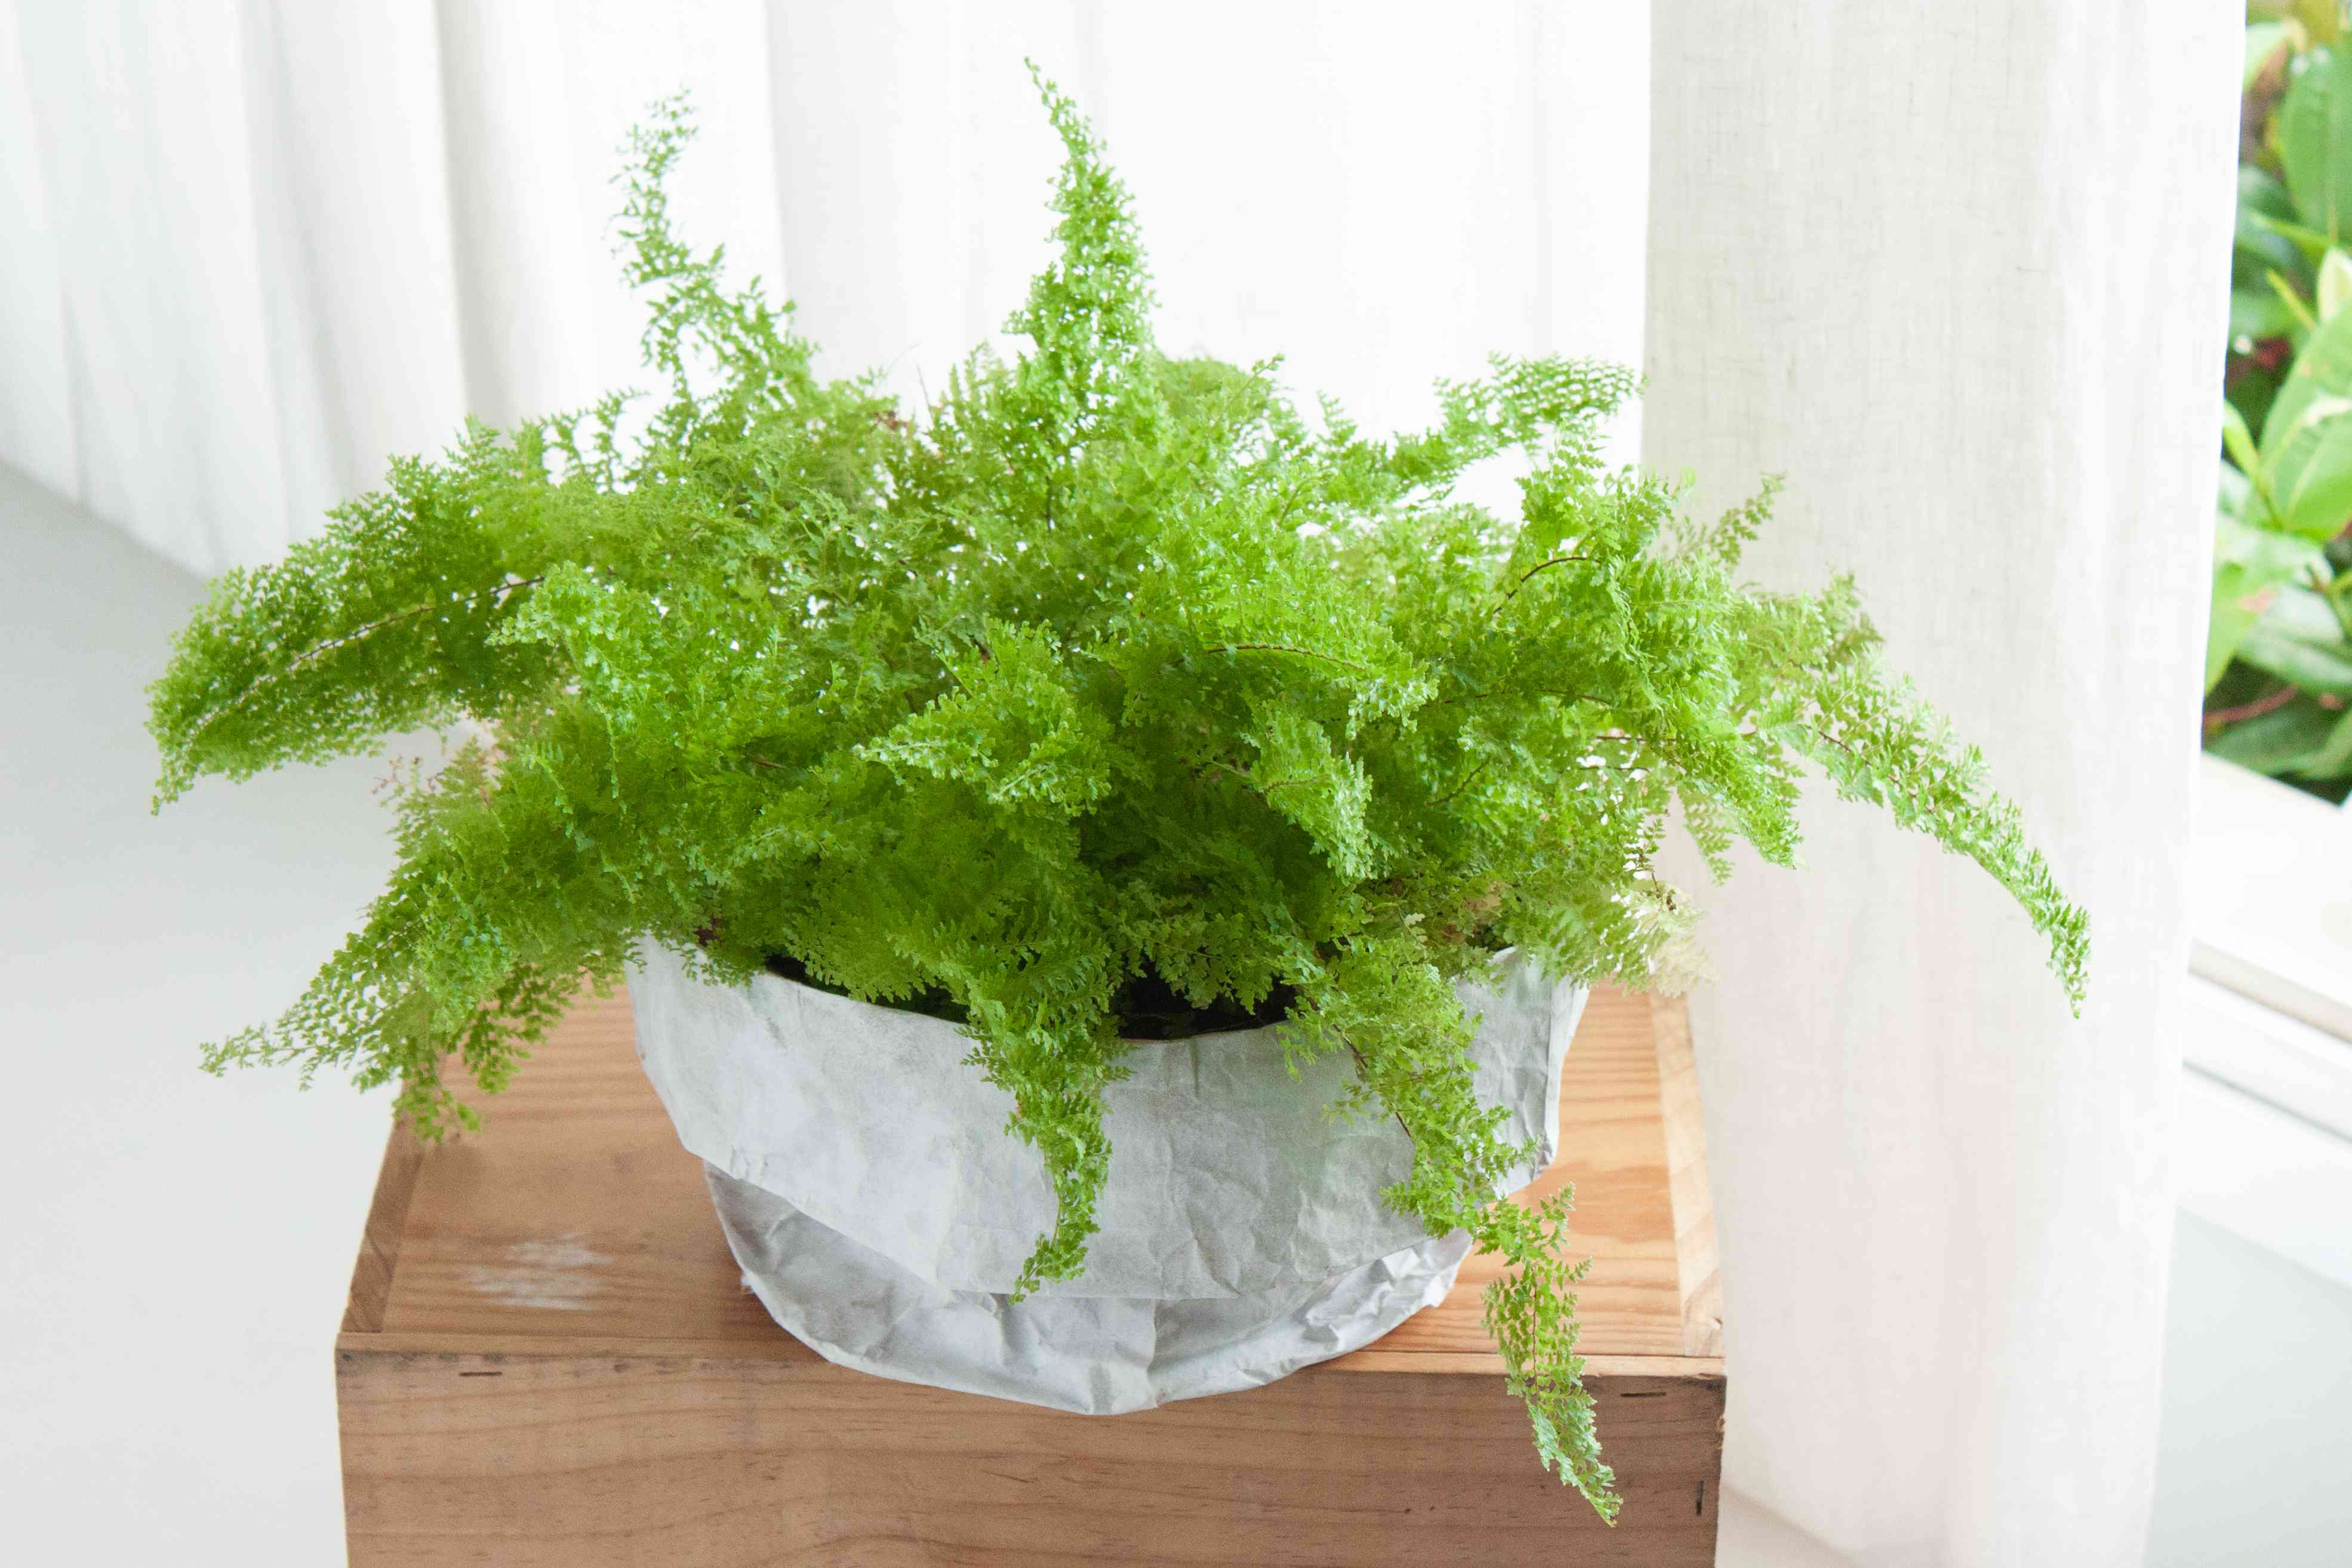 a fern positioned by a window